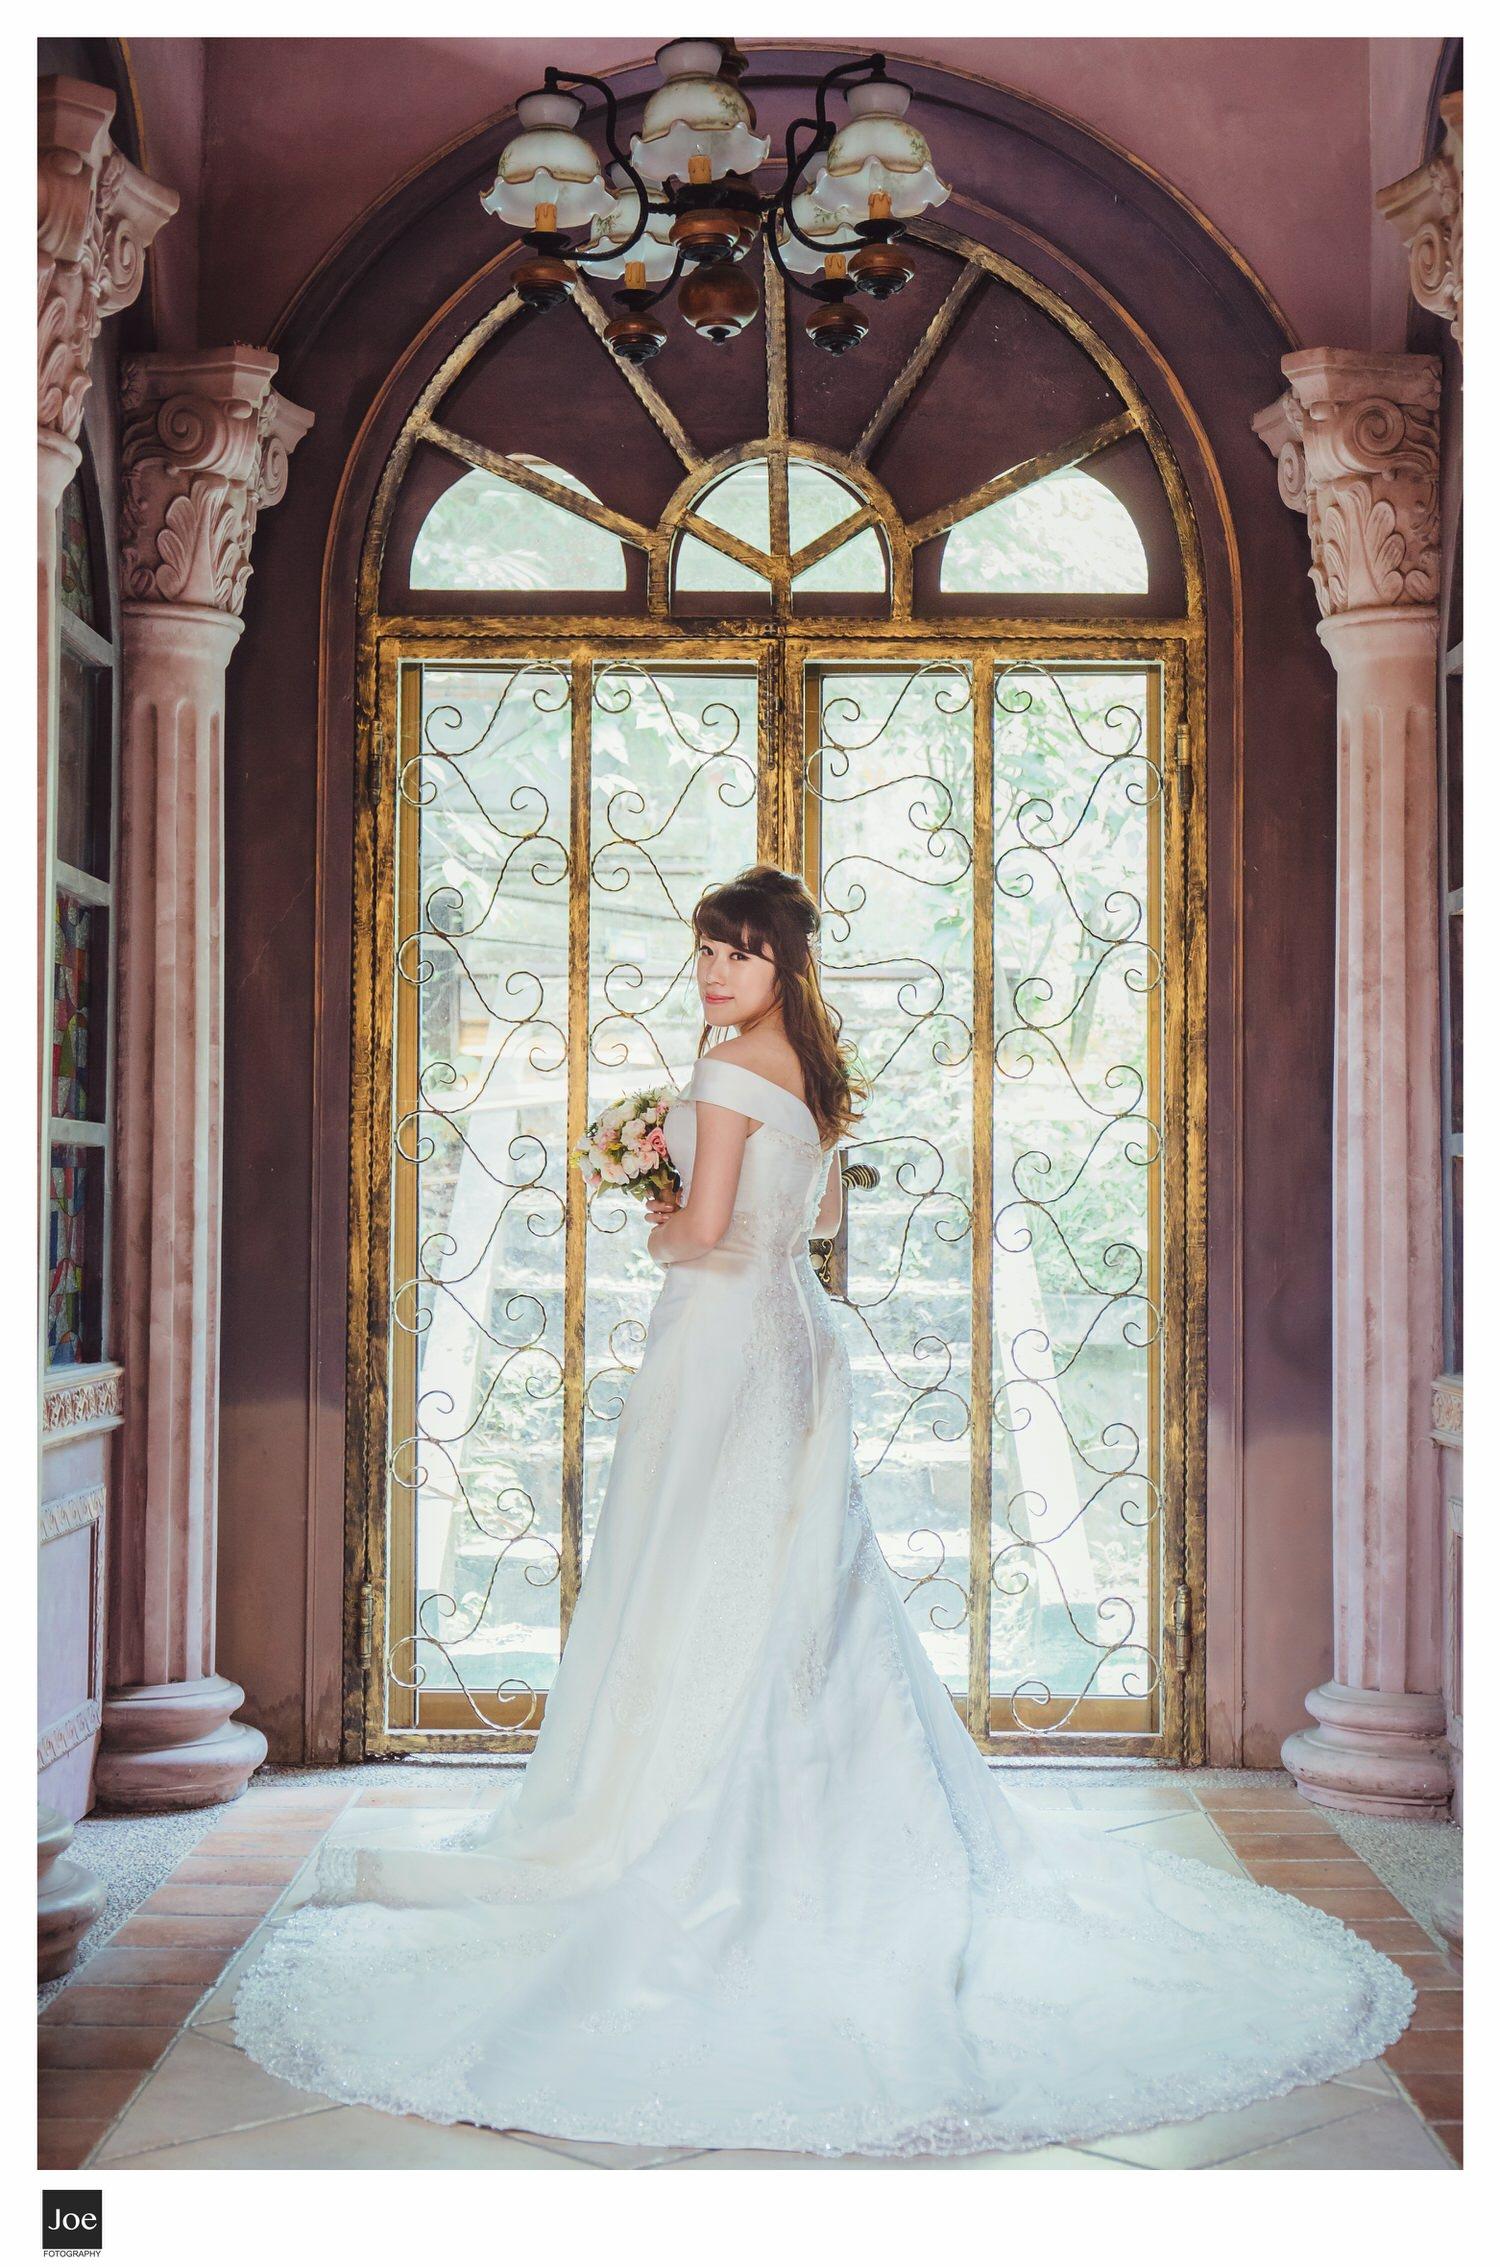 taiwan-pre-wedding-roger-wing-joe-fotography-005.jpg